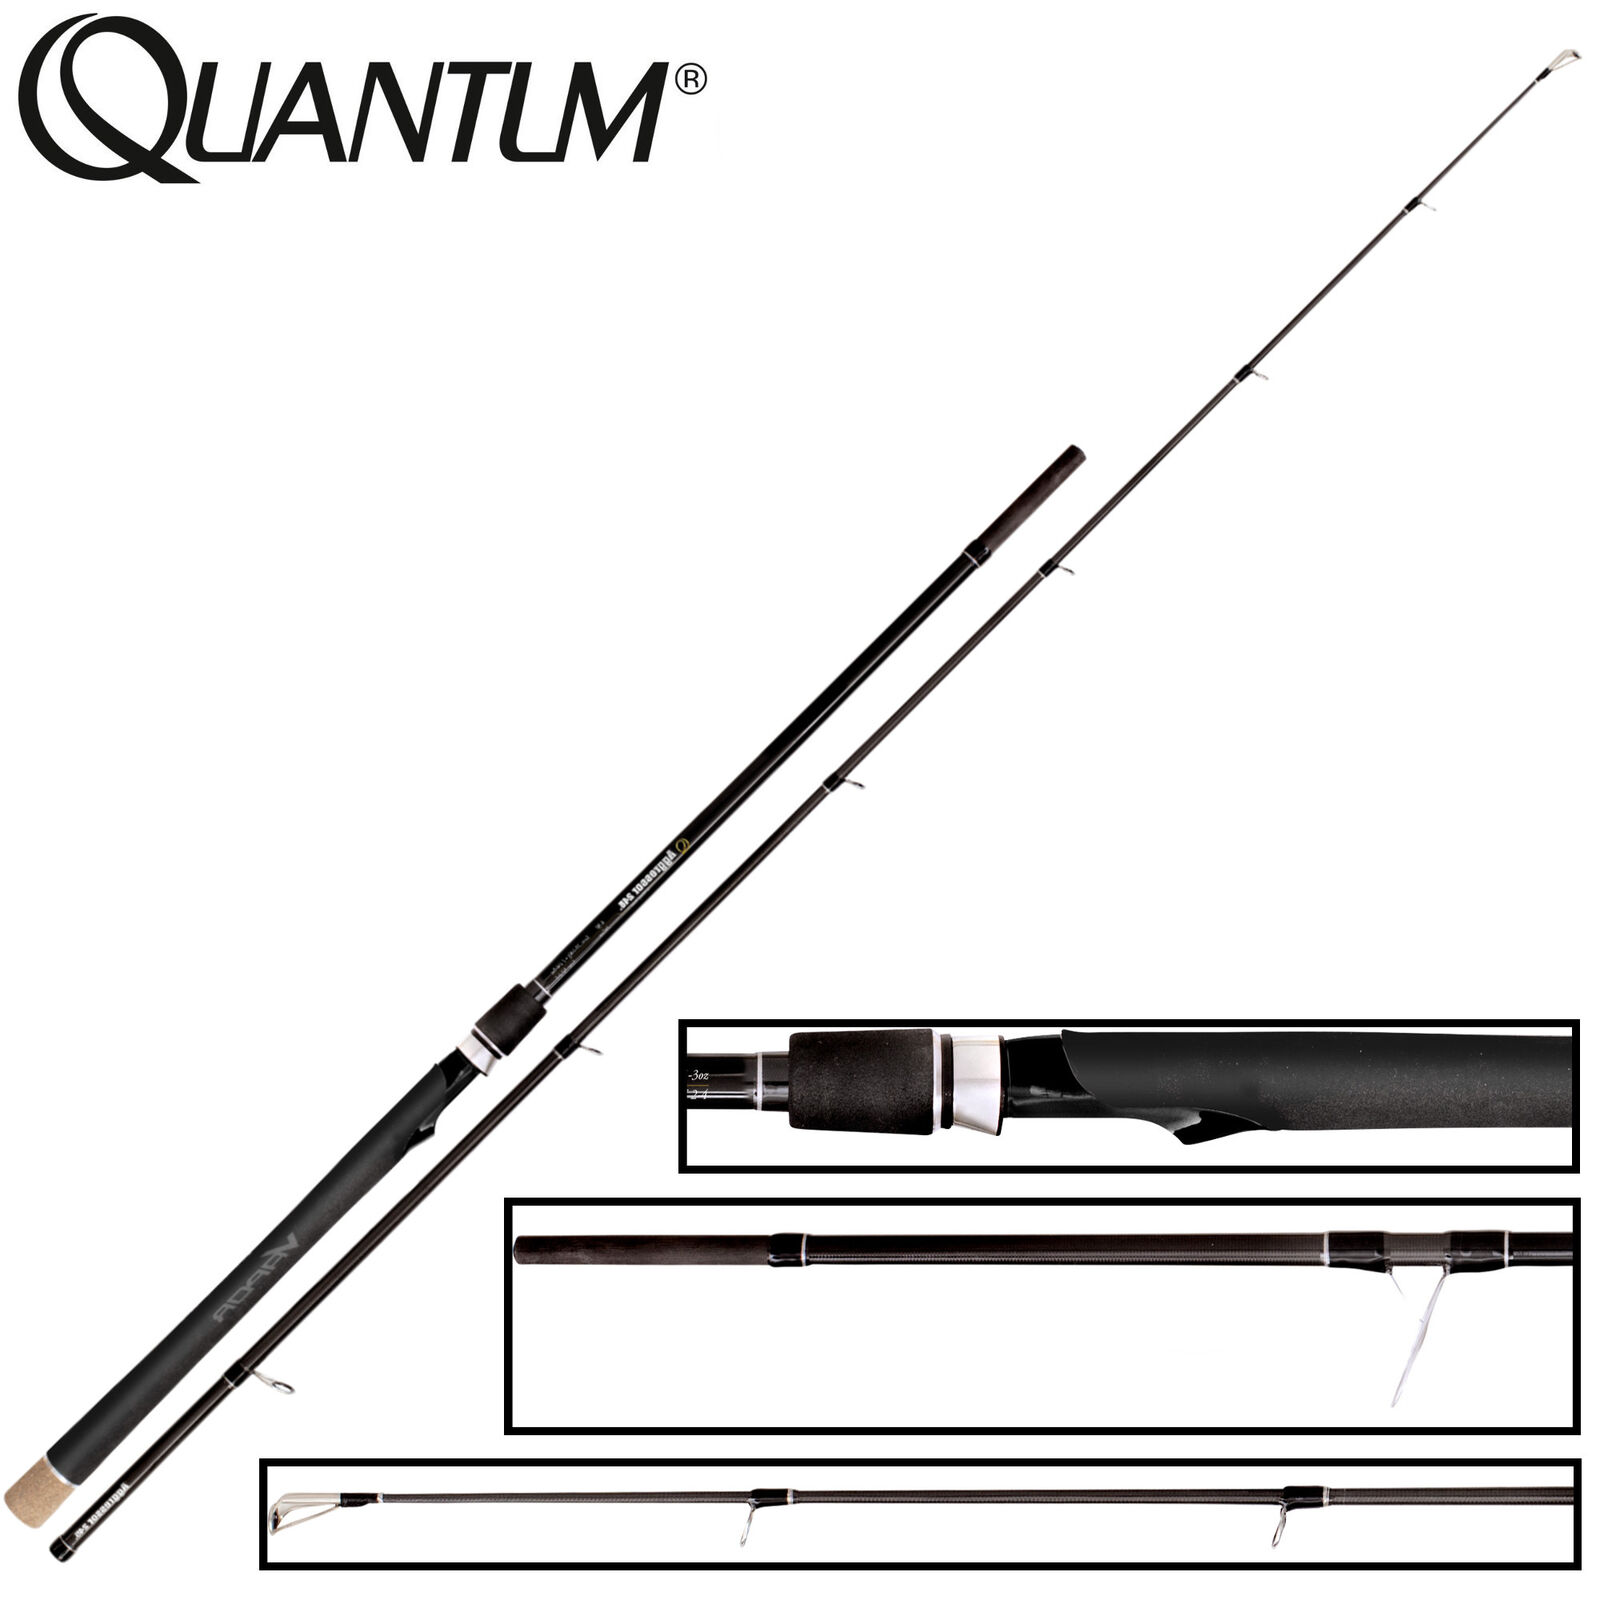 Quantum Vapor Aggressor X-Heavy Lure 245cm 35-140g 35-140g 245cm - Hechtrute, Spinnrute, Rute a09d34